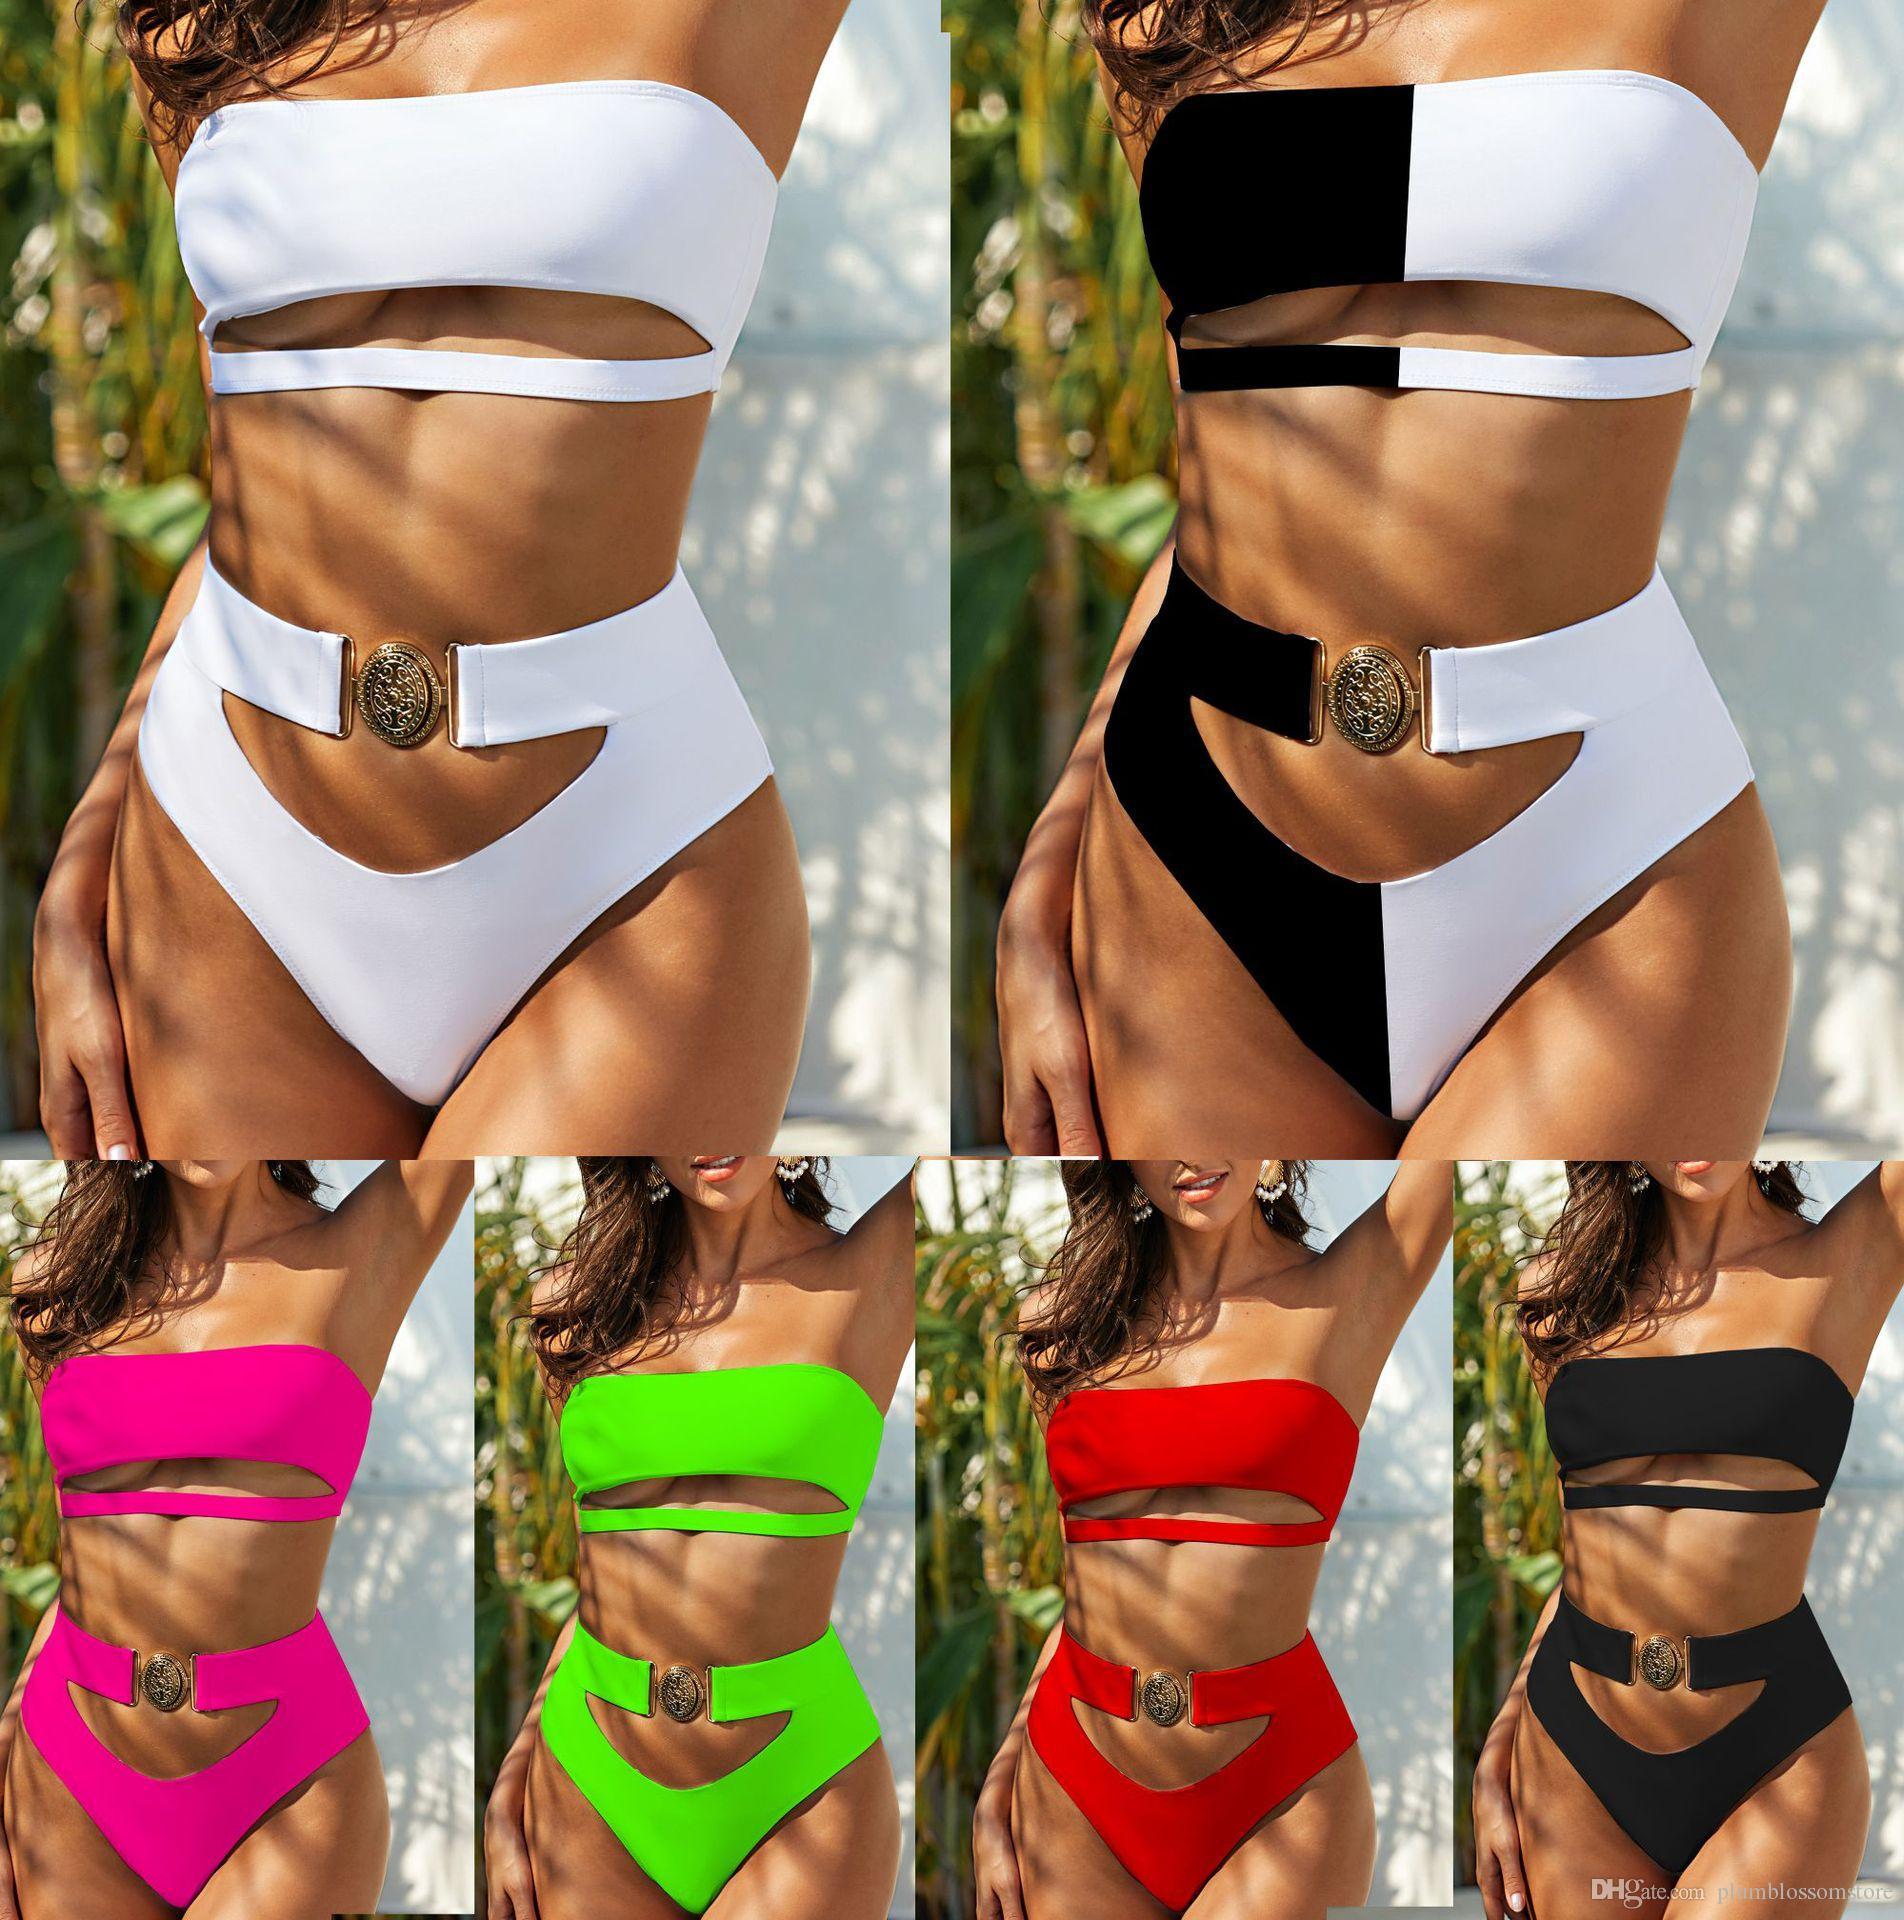 Mulheres Sexy Swimwear Biquinis Set Delicado Metal Buckle Straple Strapless Beach Two-Peça Swimsuits Swimsuits Natação Nadar Beachwear